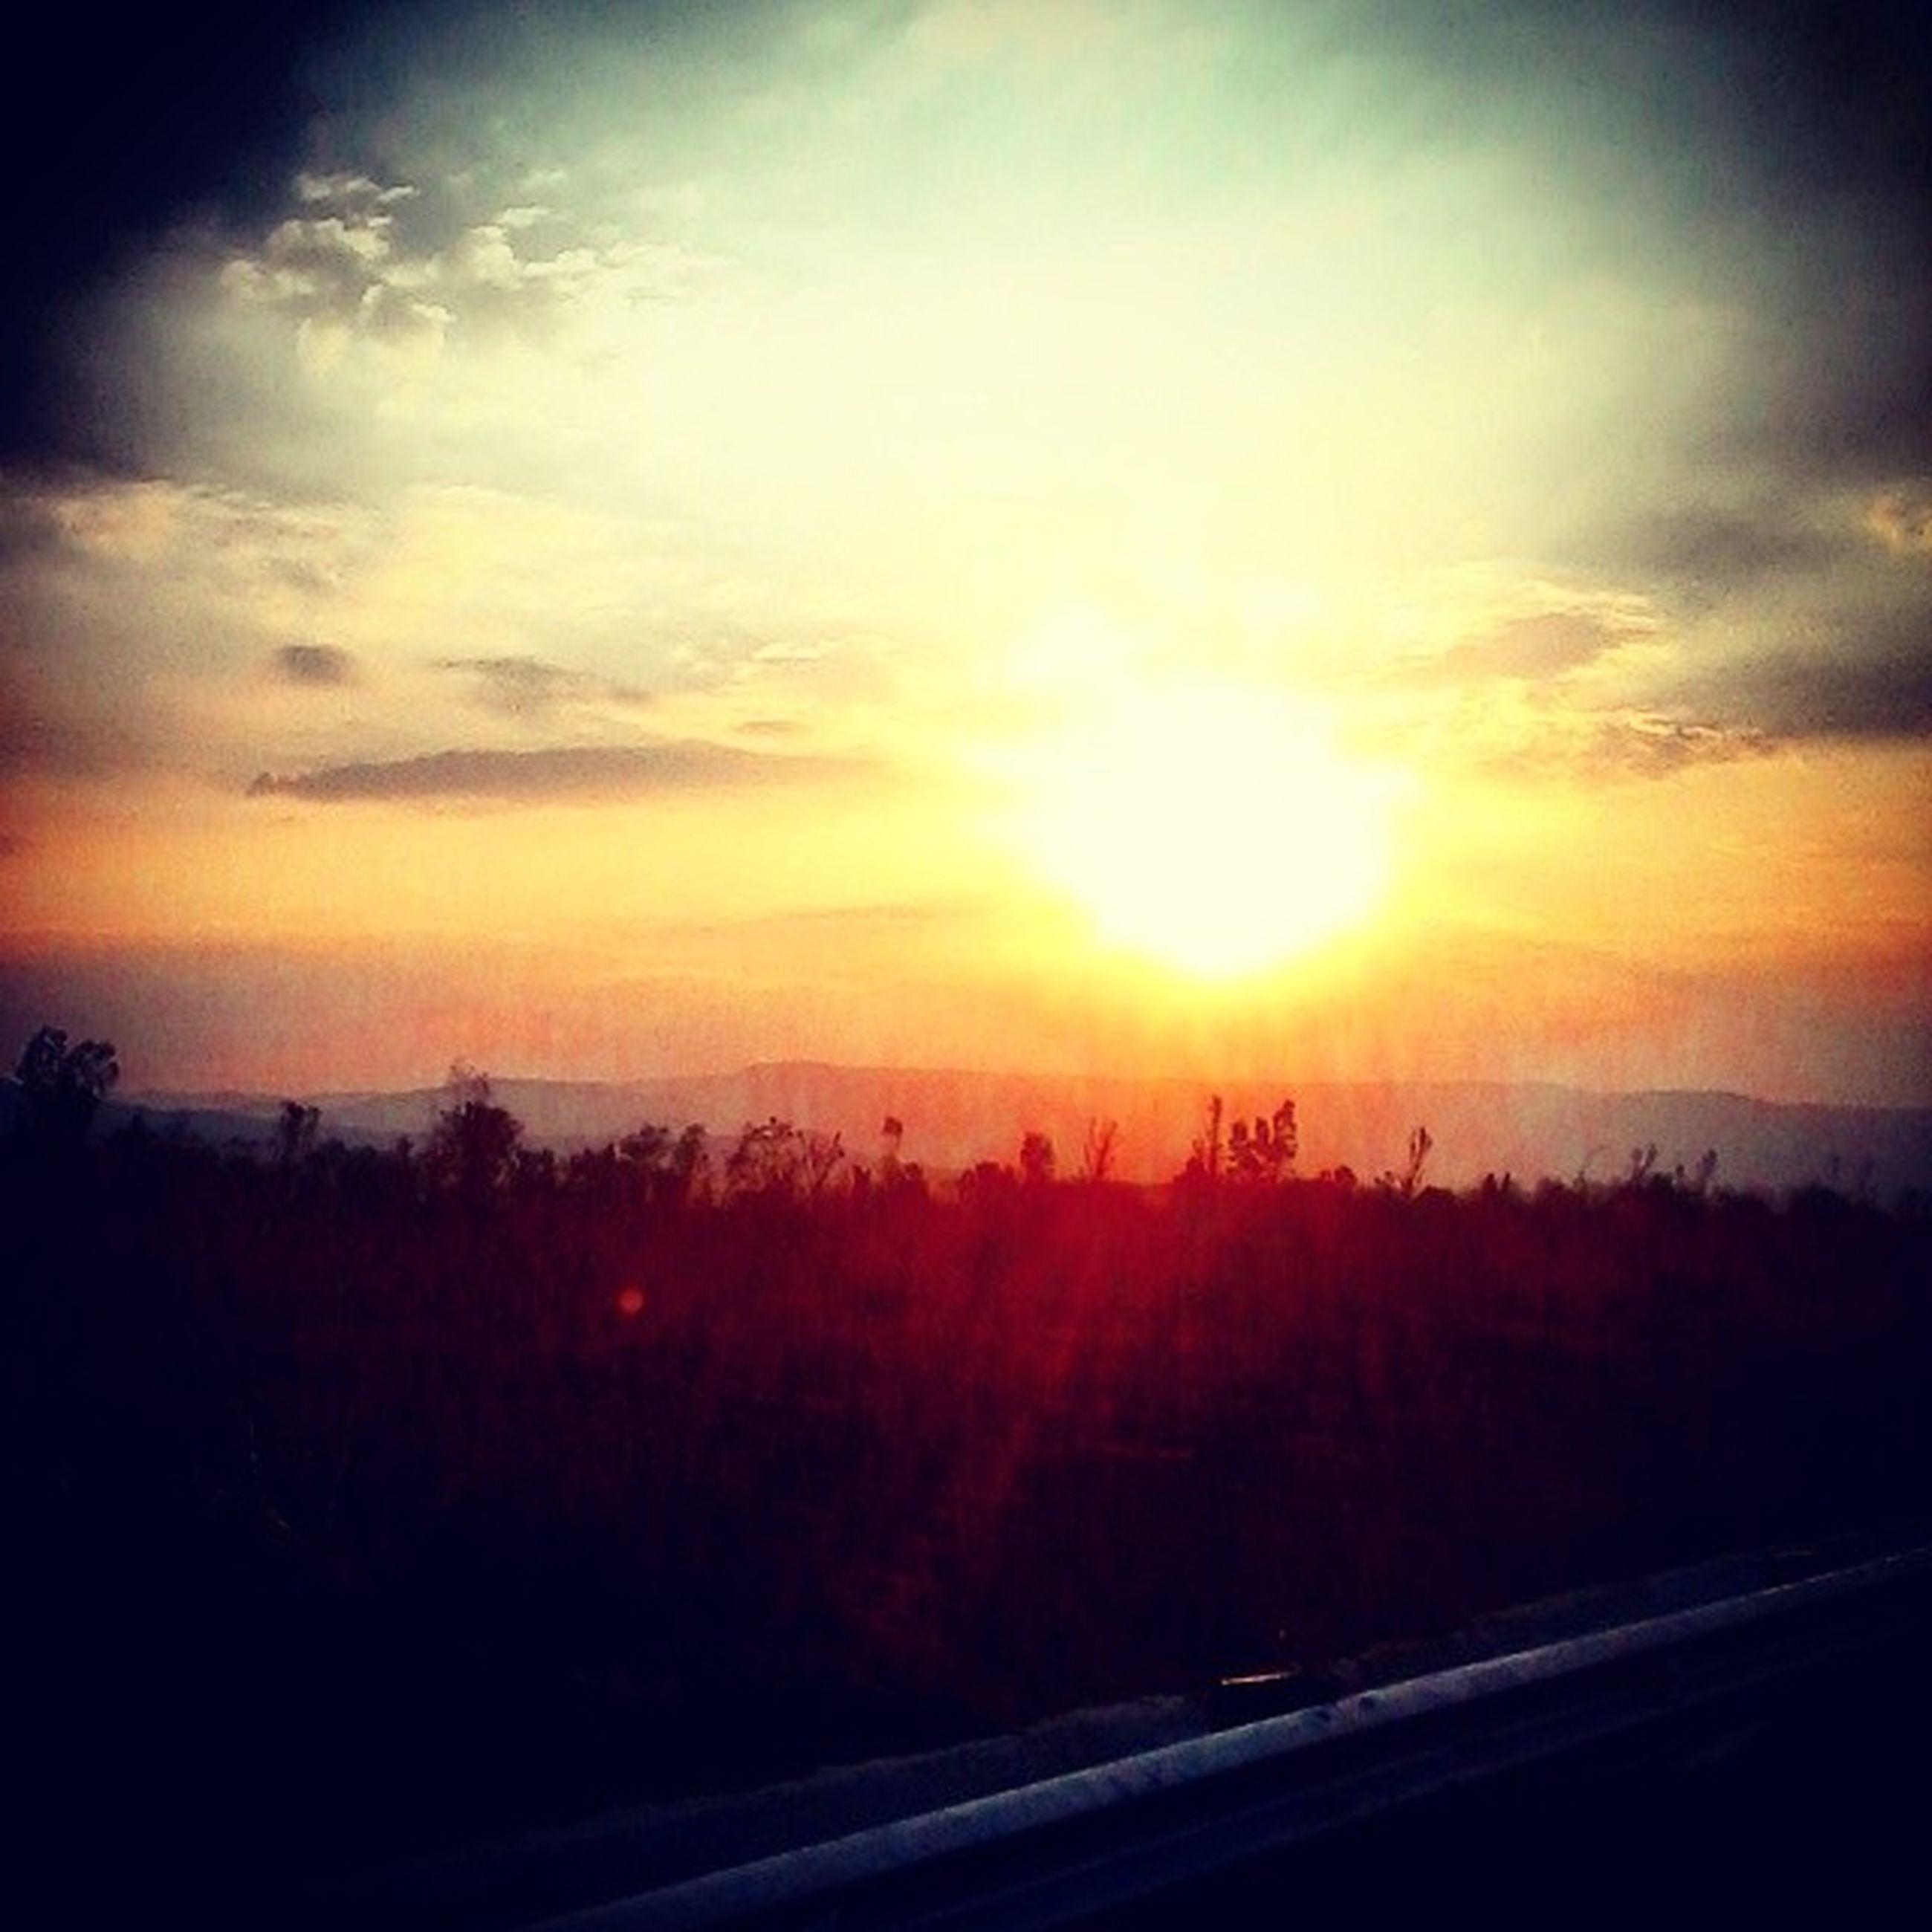 sunset, scenics, sky, silhouette, tranquil scene, beauty in nature, sun, tranquility, landscape, orange color, nature, cloud - sky, tree, idyllic, sunlight, sunbeam, cloud, outdoors, non-urban scene, no people